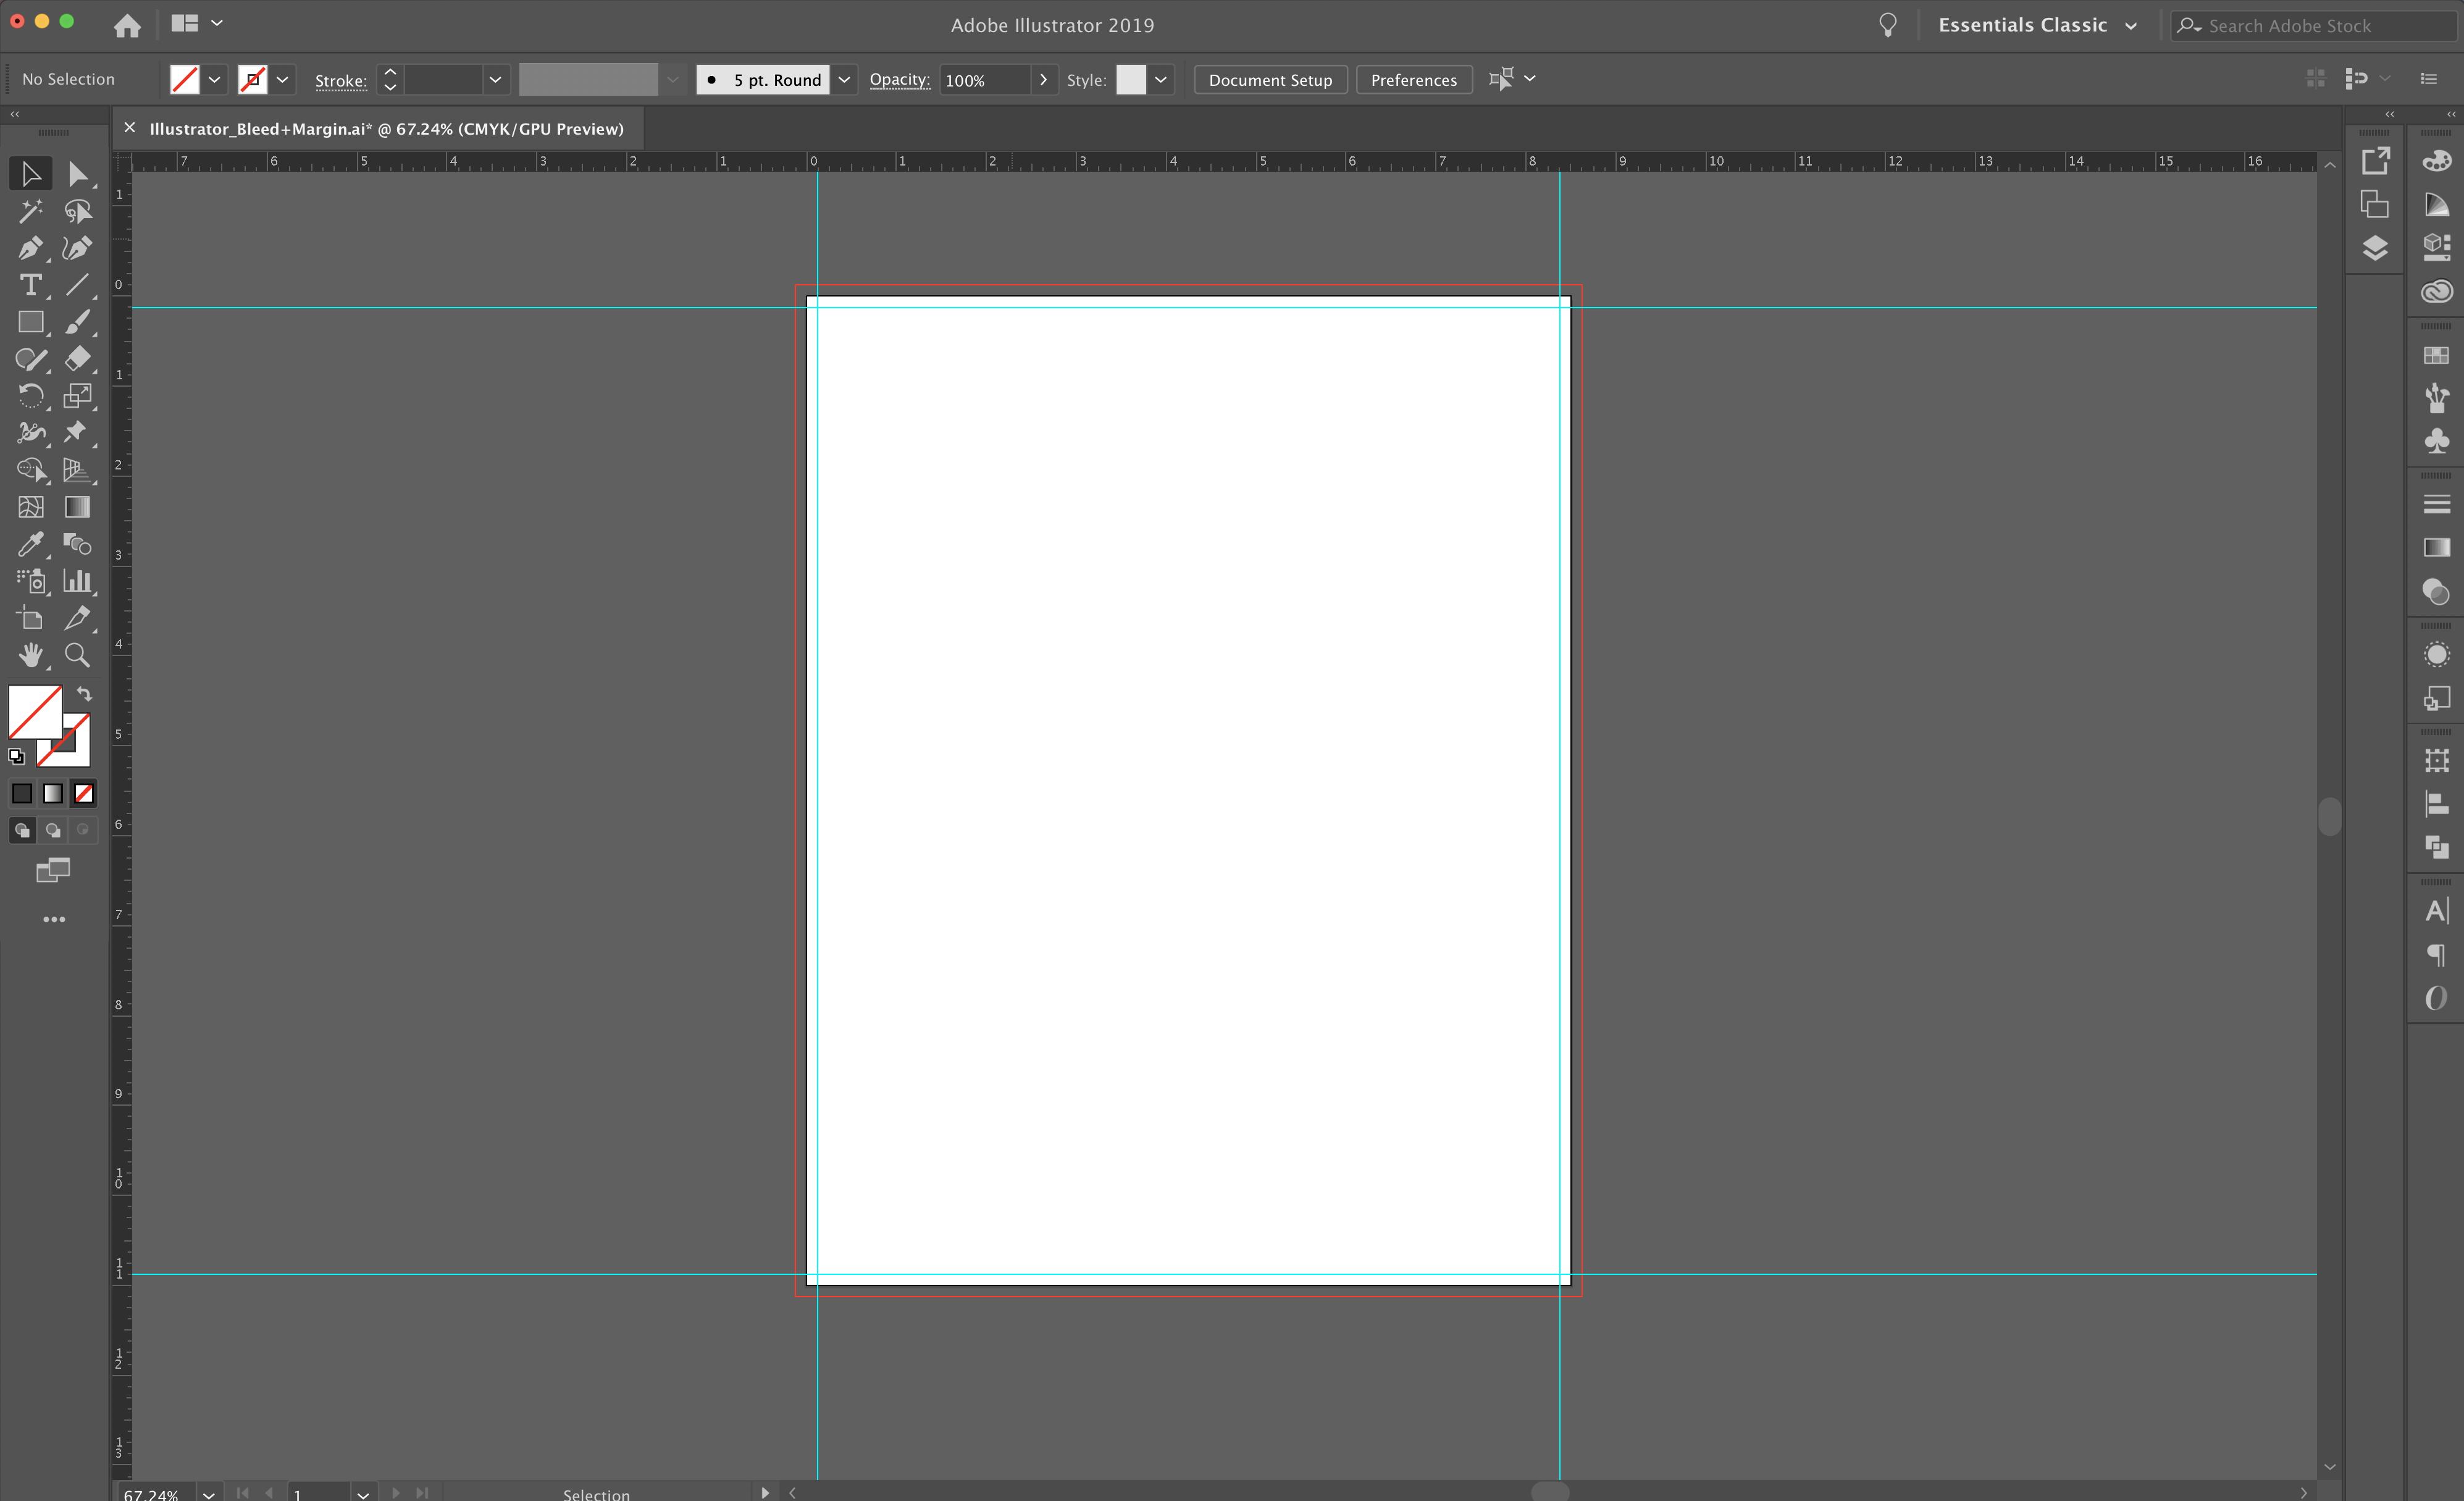 Illustrator_New Document